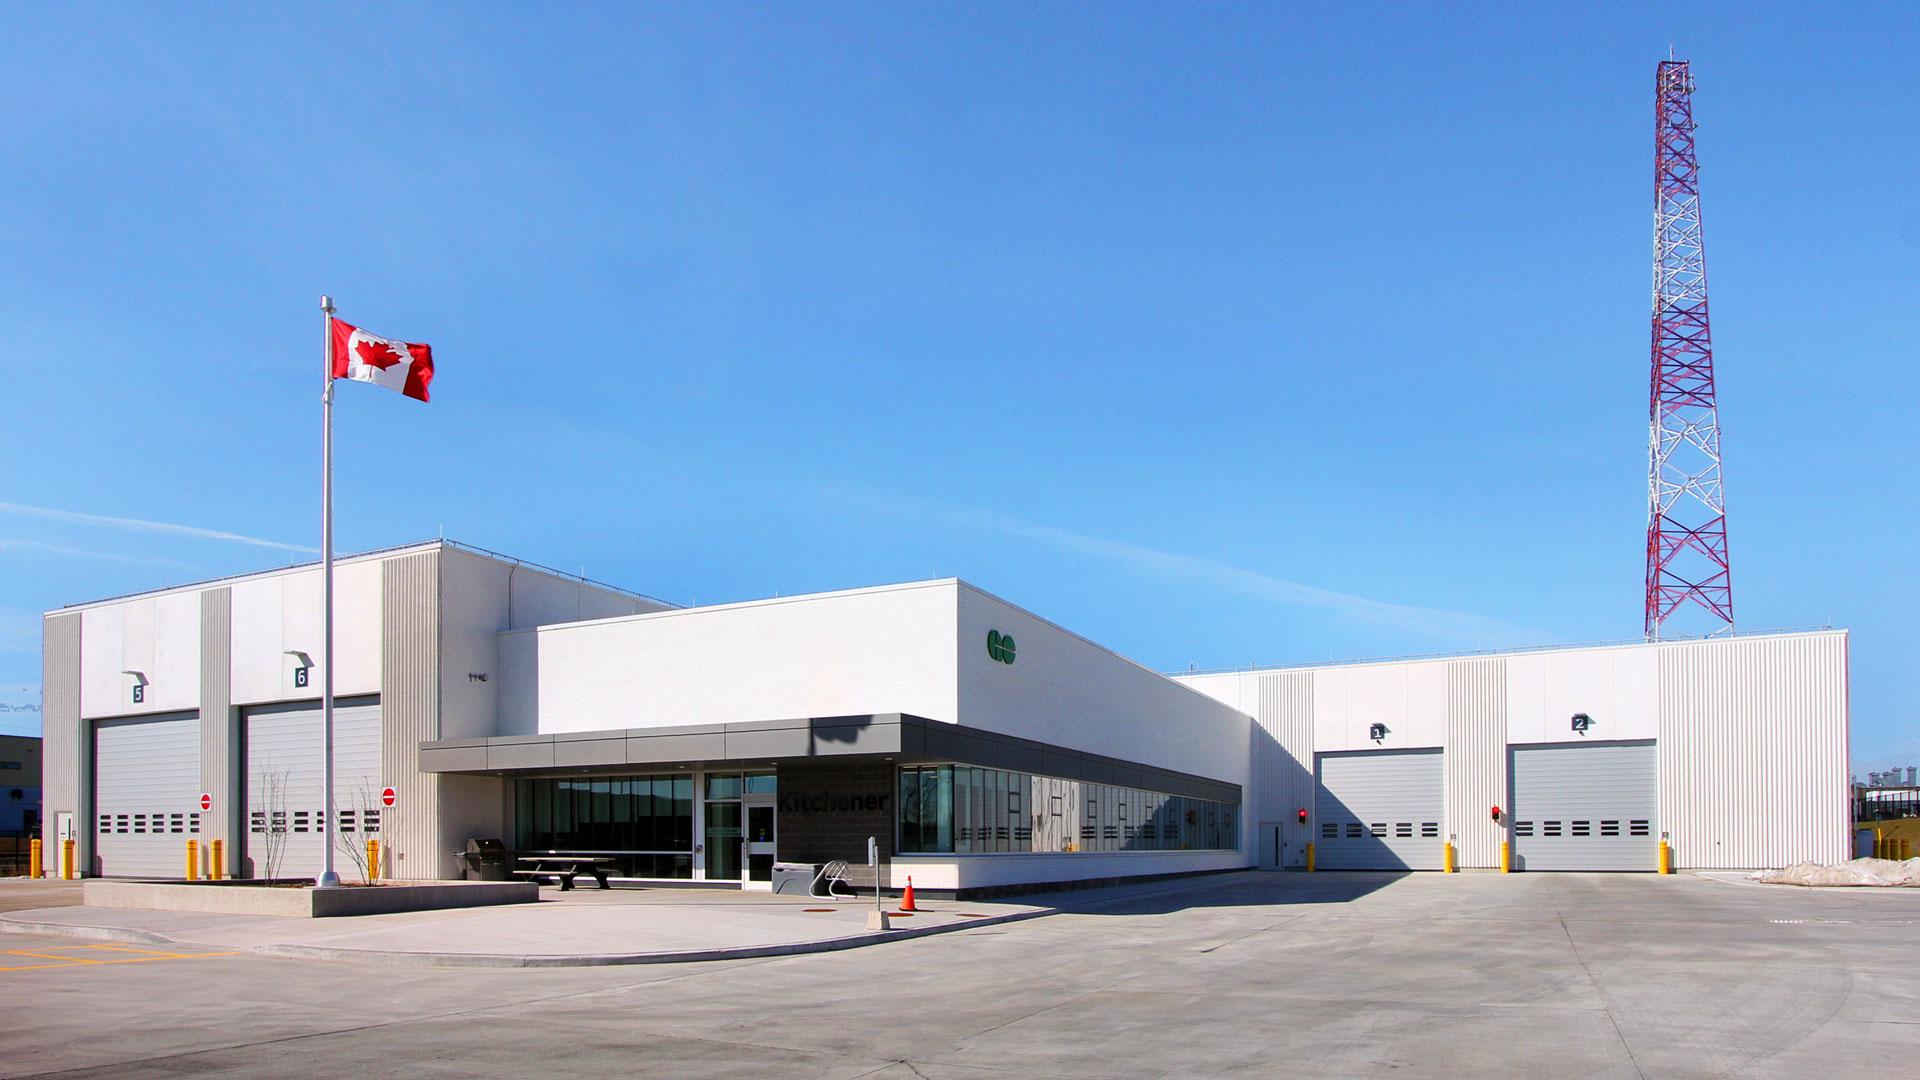 Exterior photo of the facility